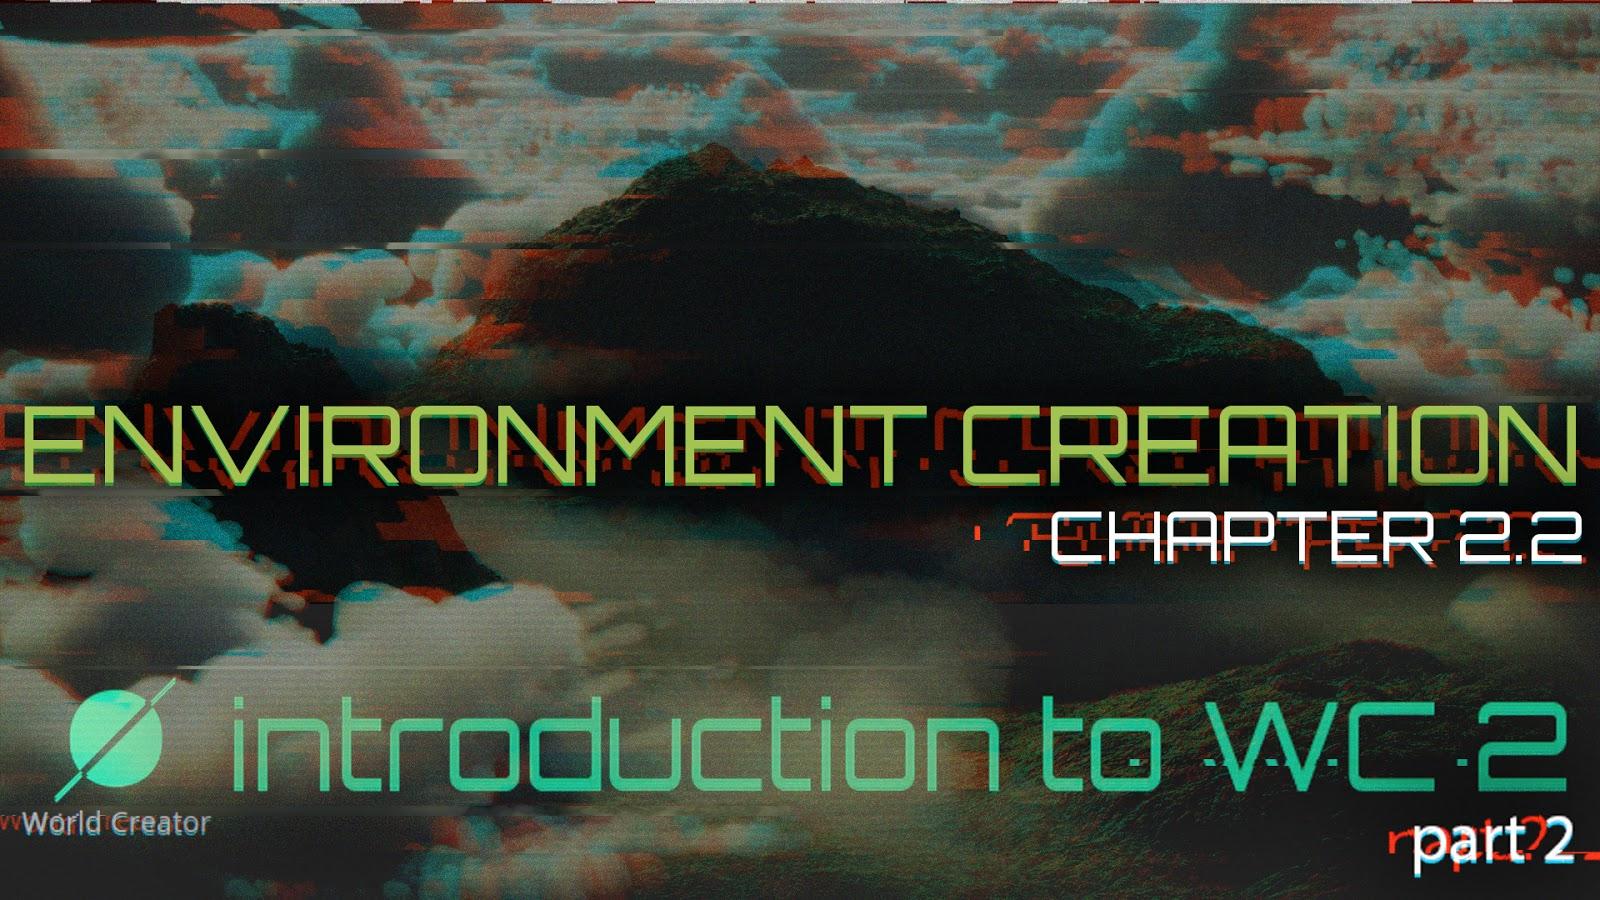 ENVIRONMENT_CREATIONc22wcp2.jpg